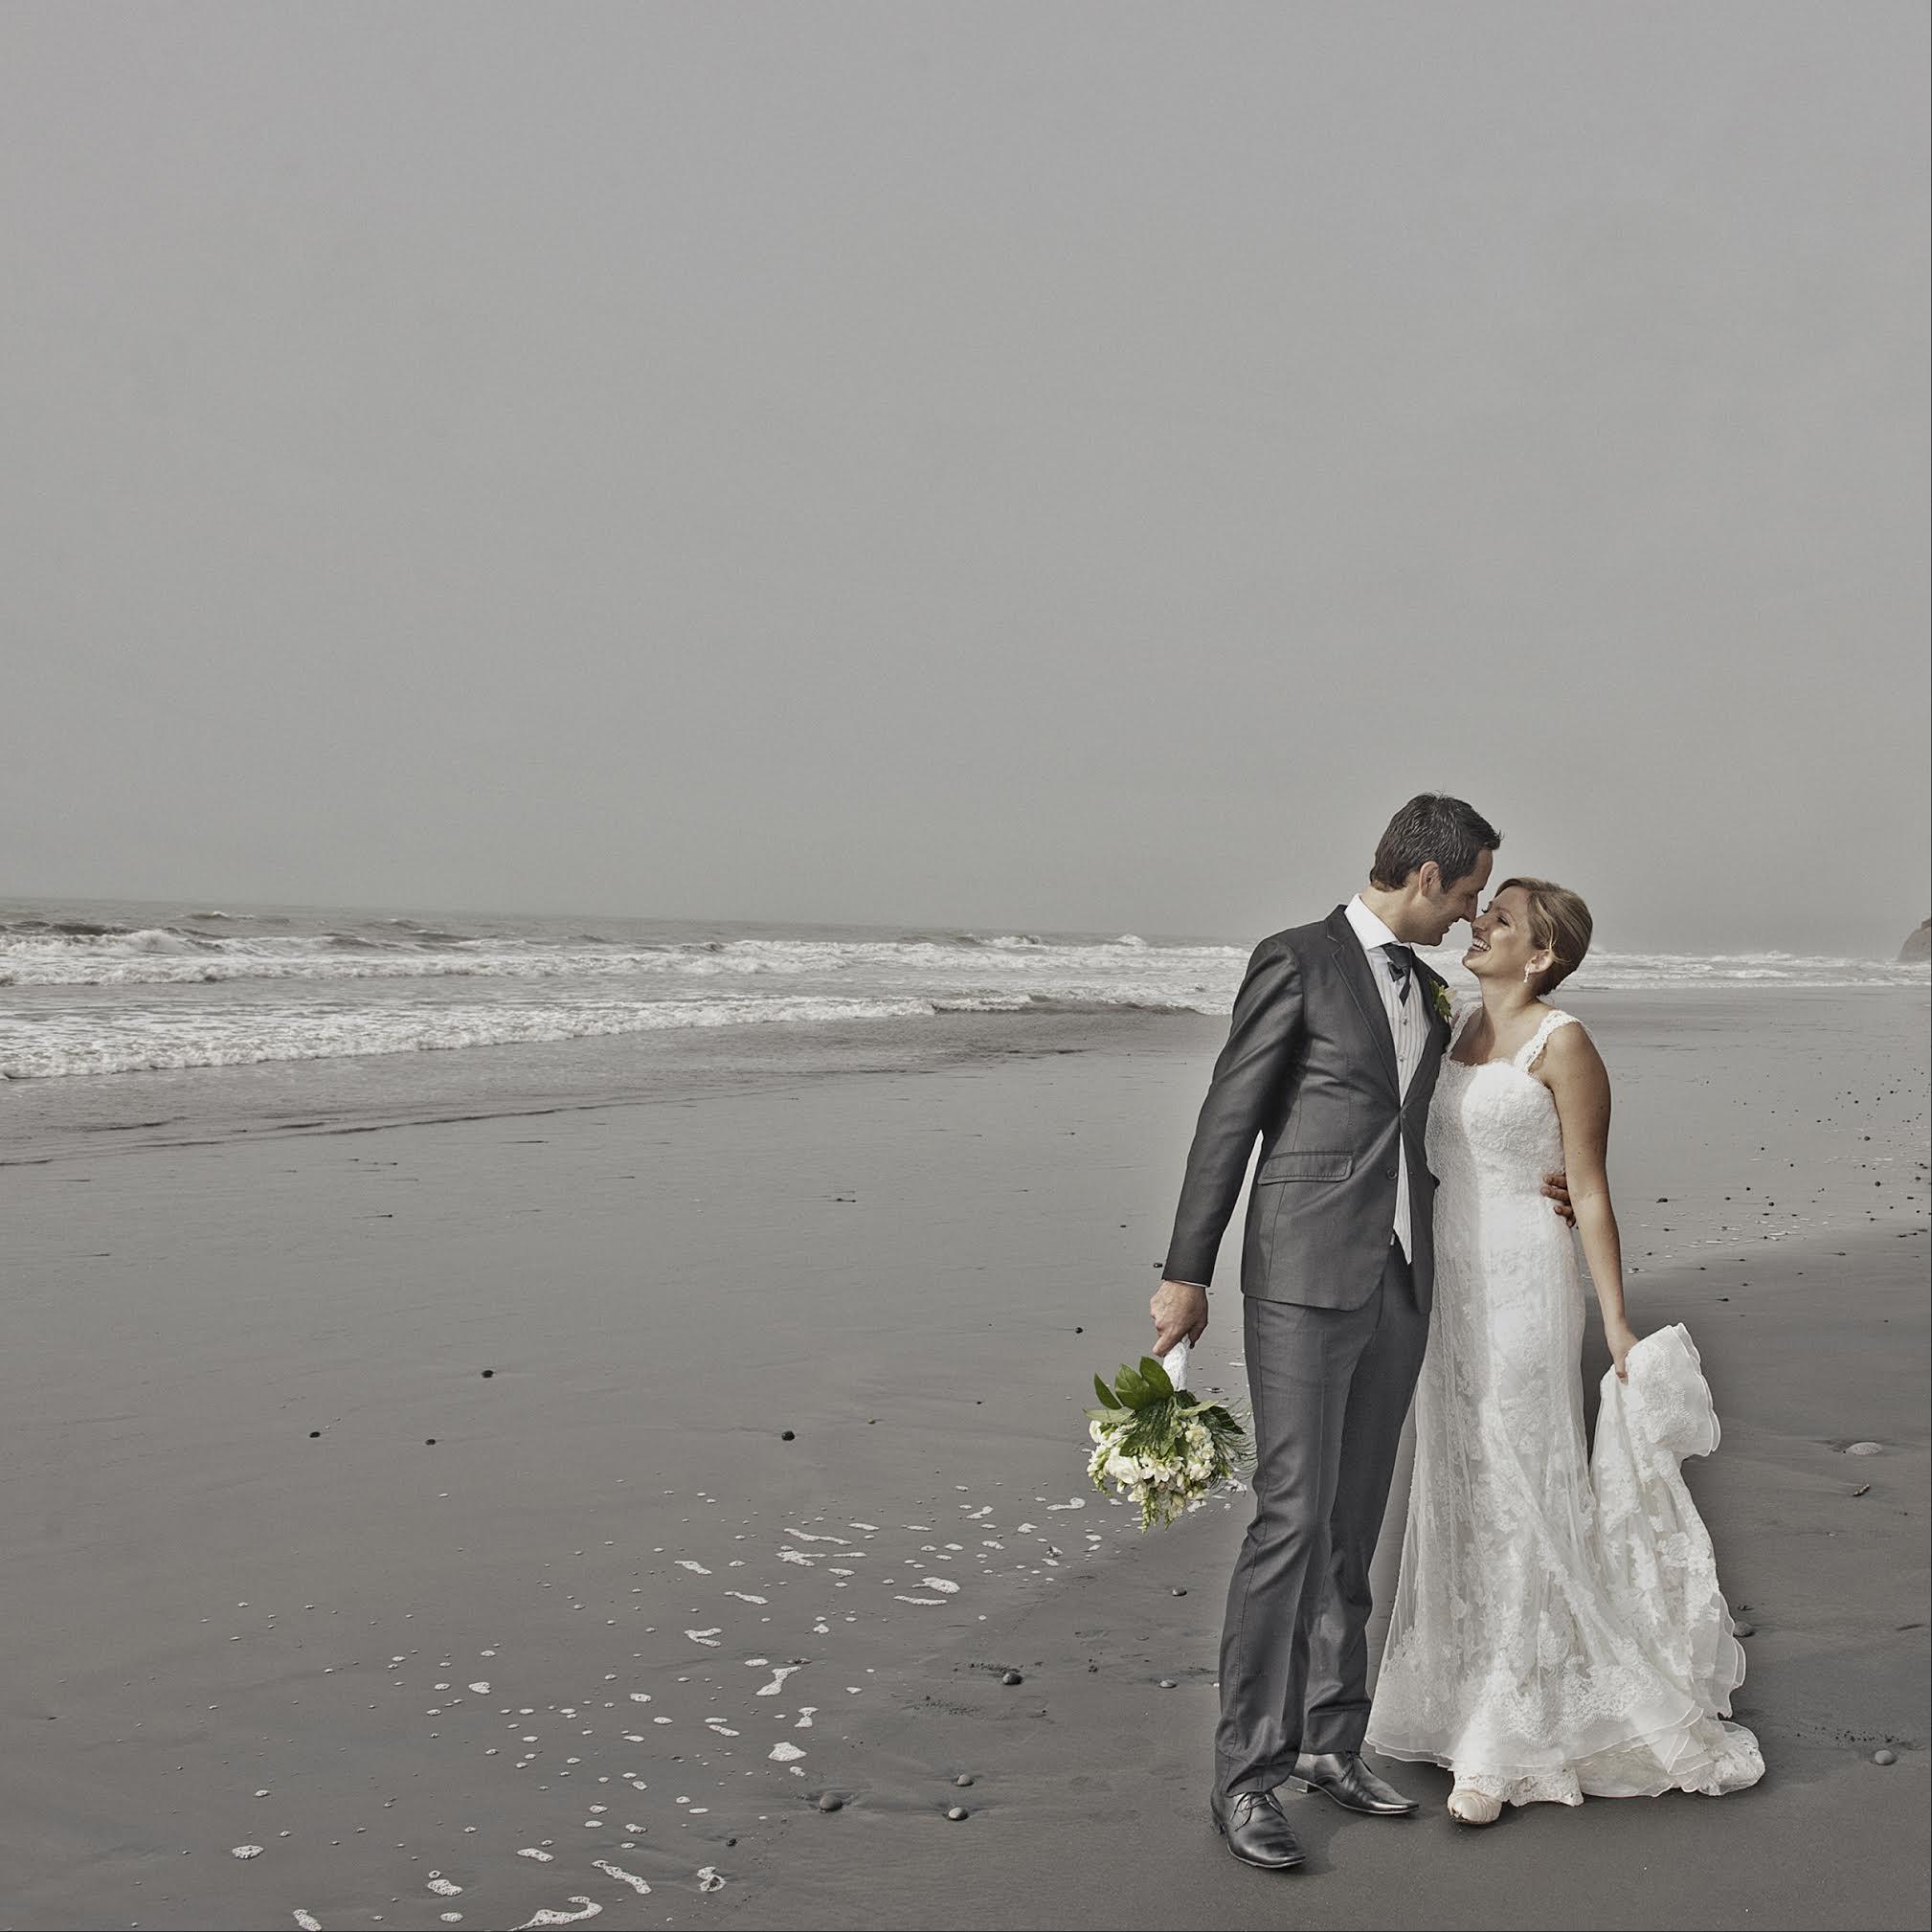 Tony Carter Photography Weddings Homepage 13.jpg